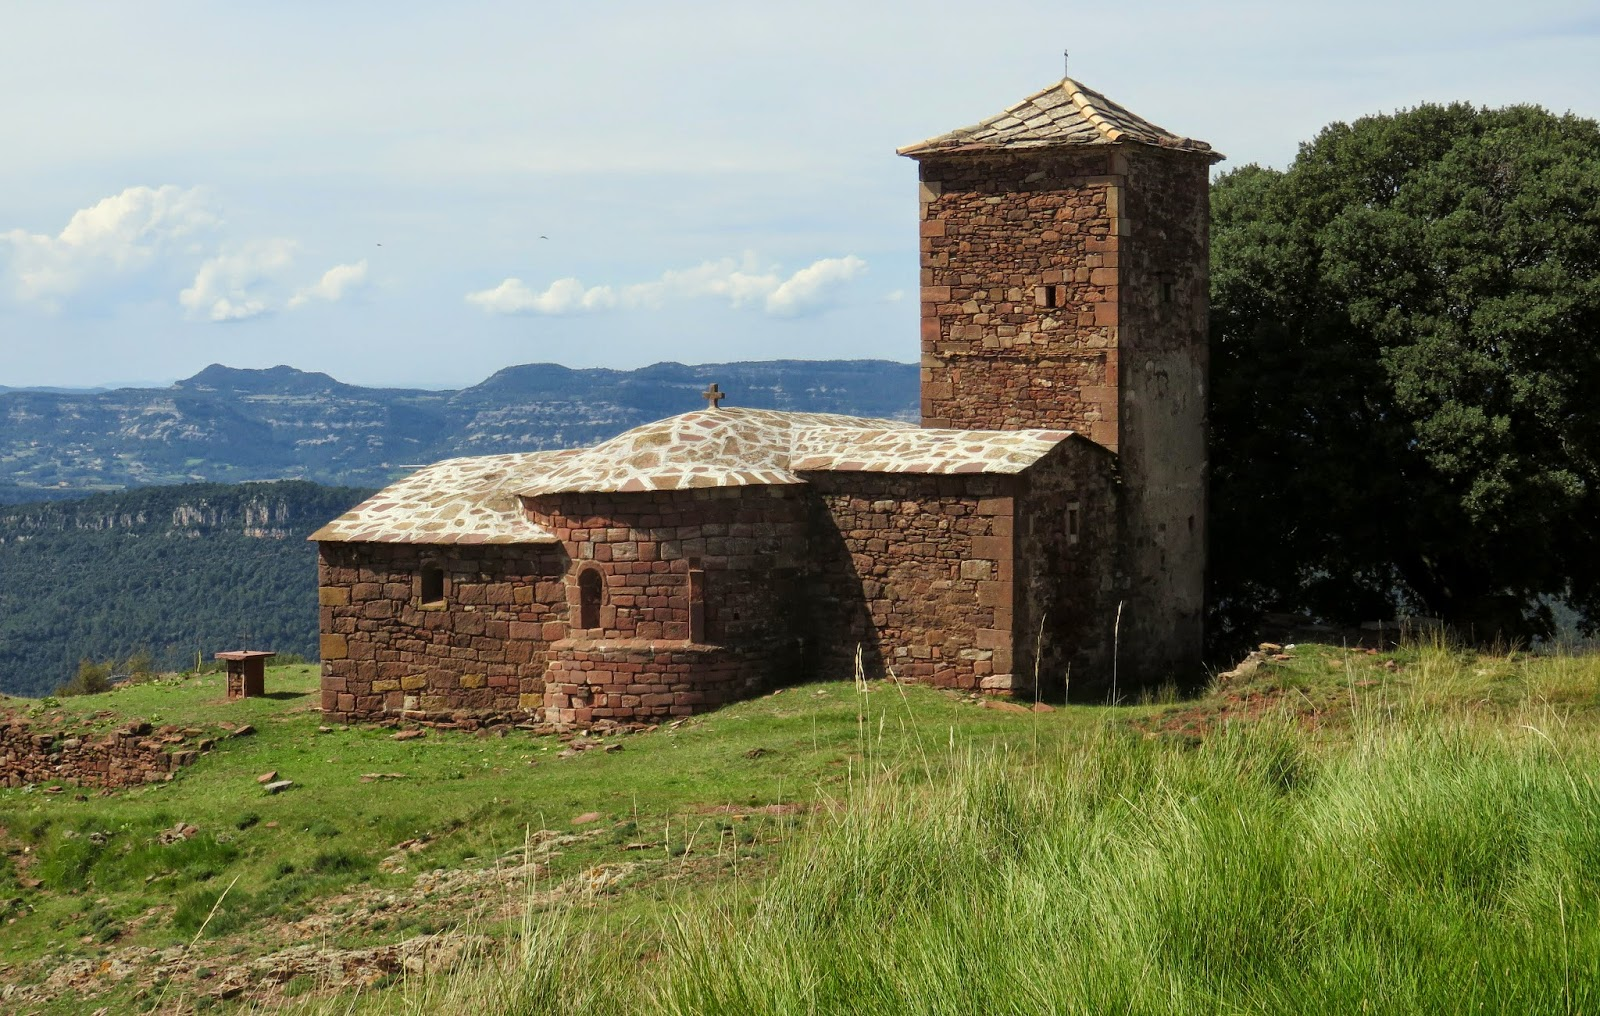 COLLFORMIC - BRUGÈS - SANT CEBRIÀ DE MÓRA